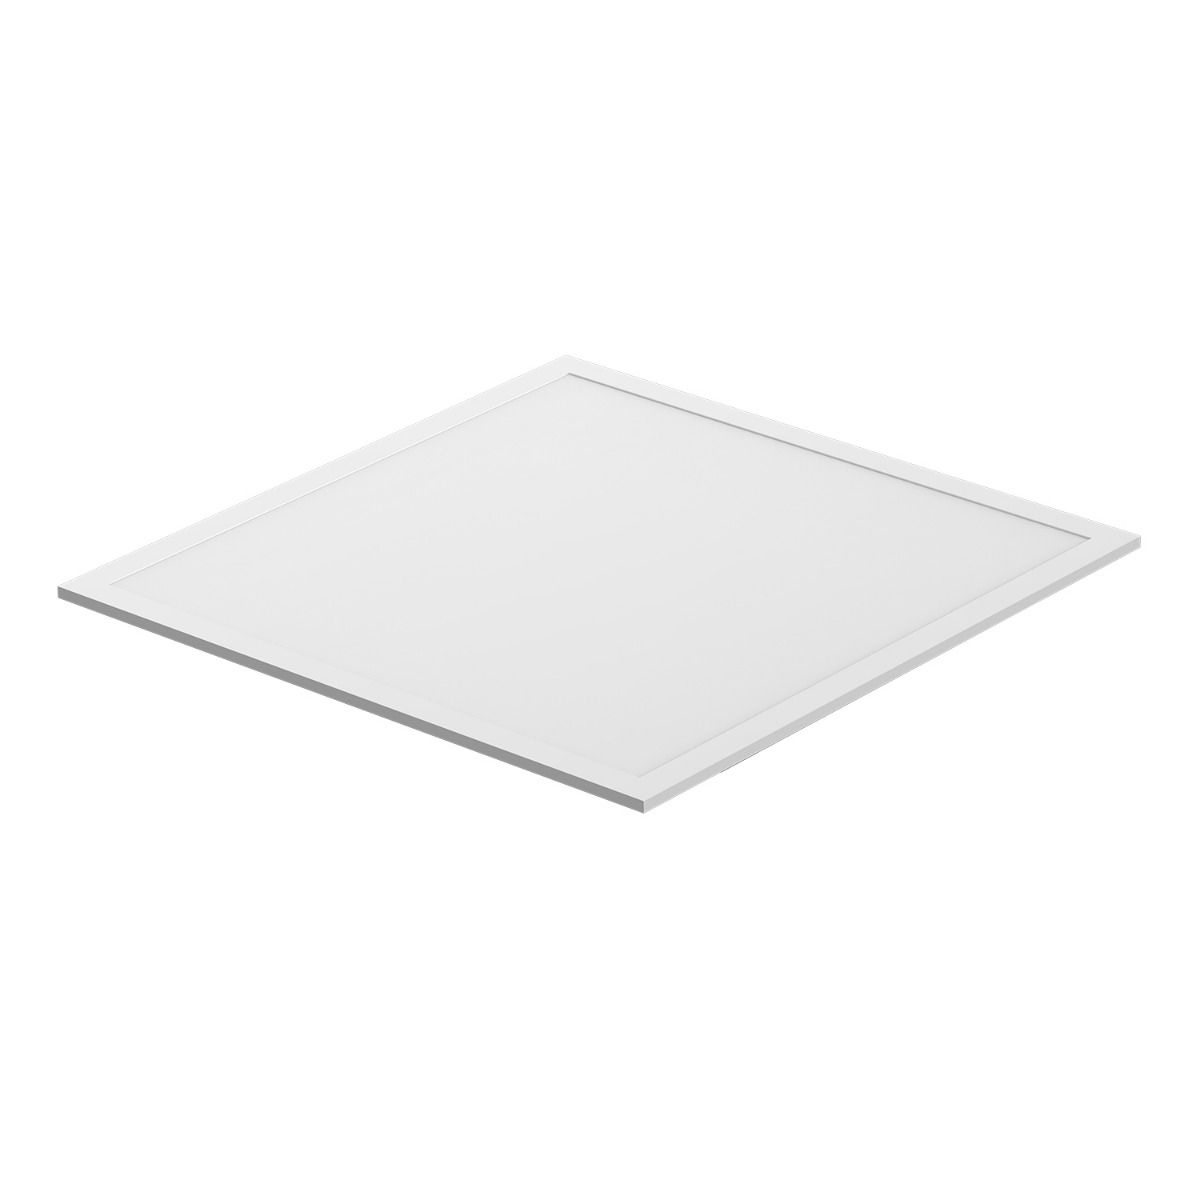 Noxion LED Panel Delta Pro V2.0 Xitanium DALI 30W 60x60cm 6500K 4110lm UGR